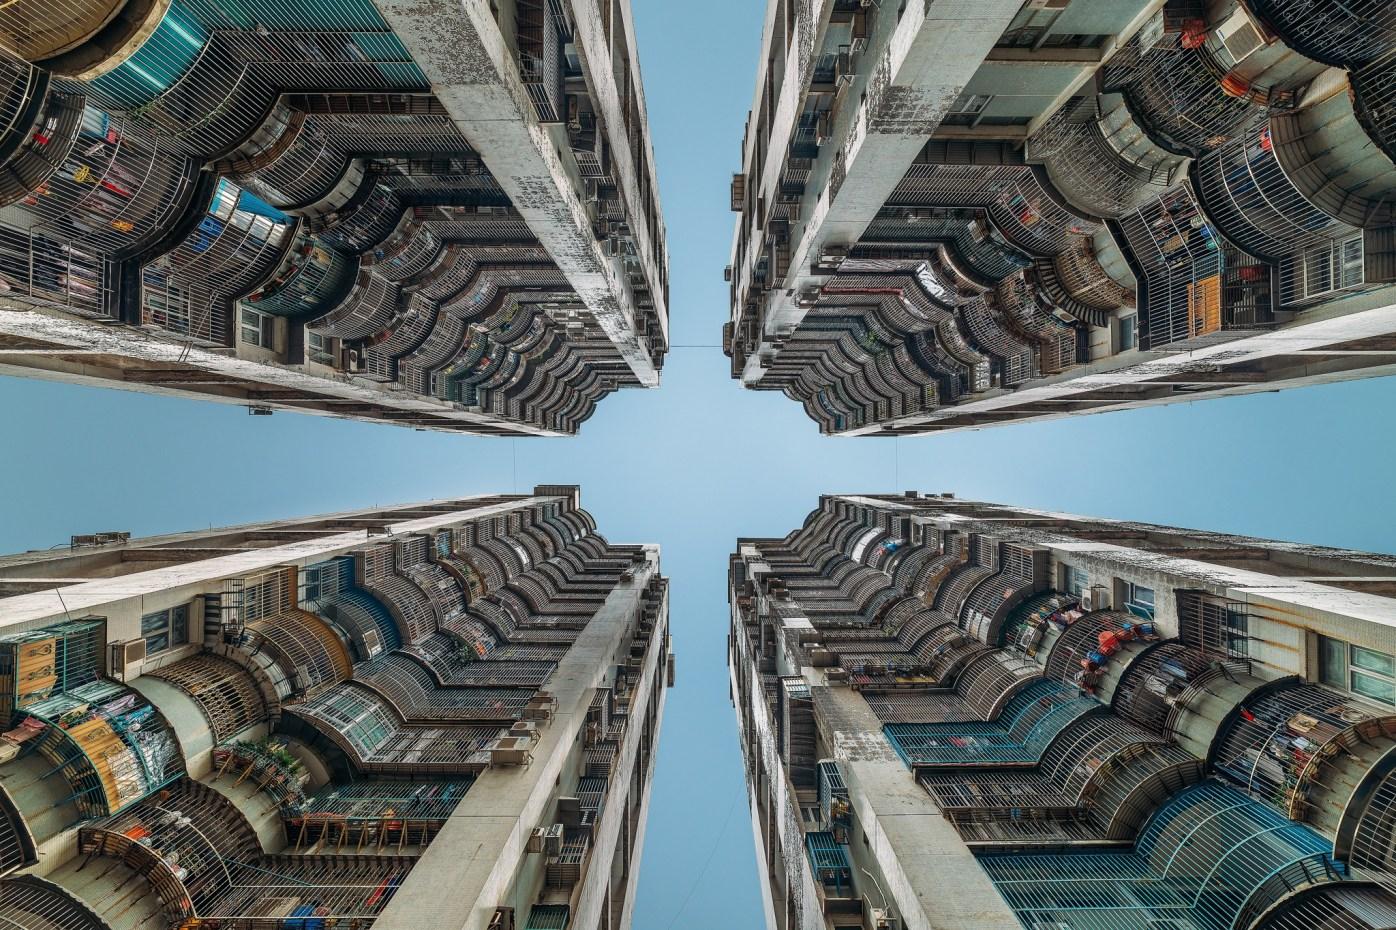 Skycage - Macau, China